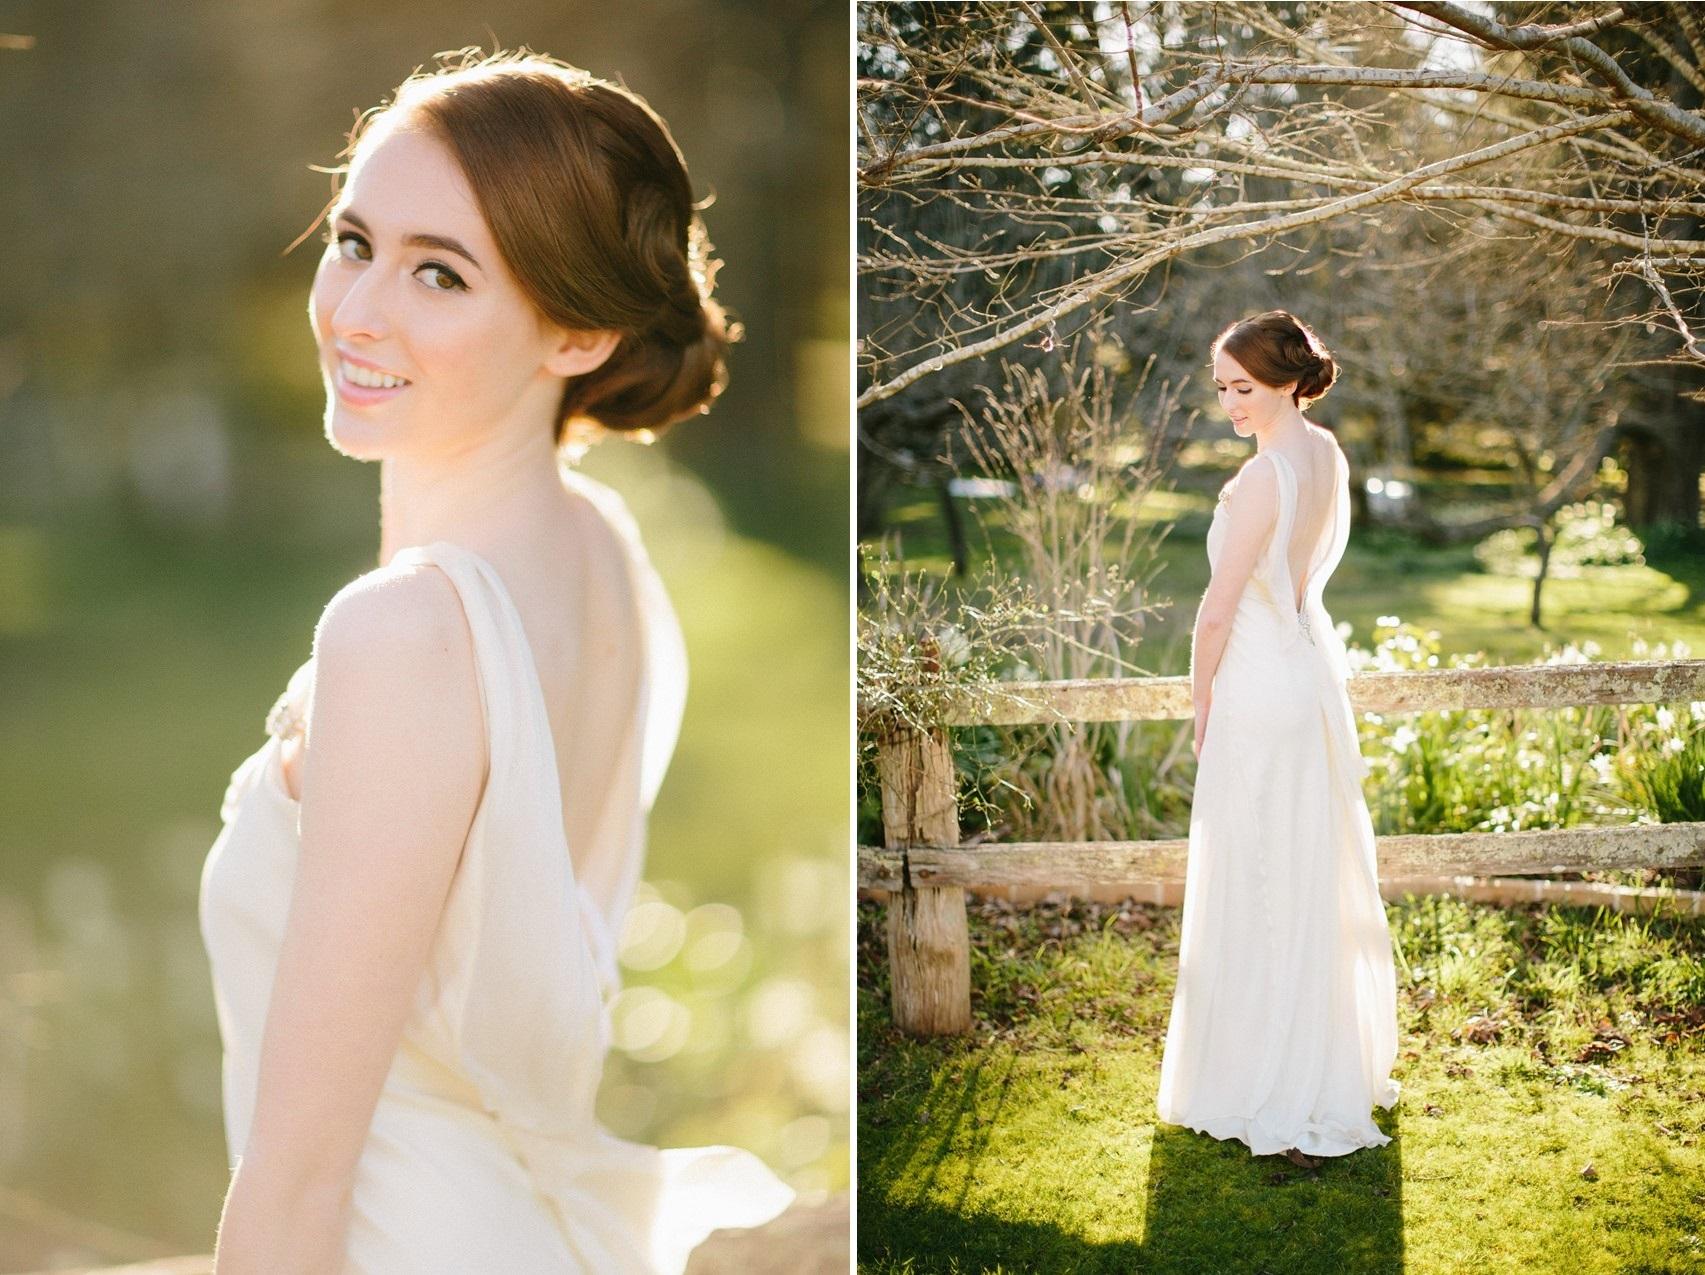 Elegant Vintage Bride - A Rustic Vintage Wedding Inspiration Shoot at Montrose Berry Farm